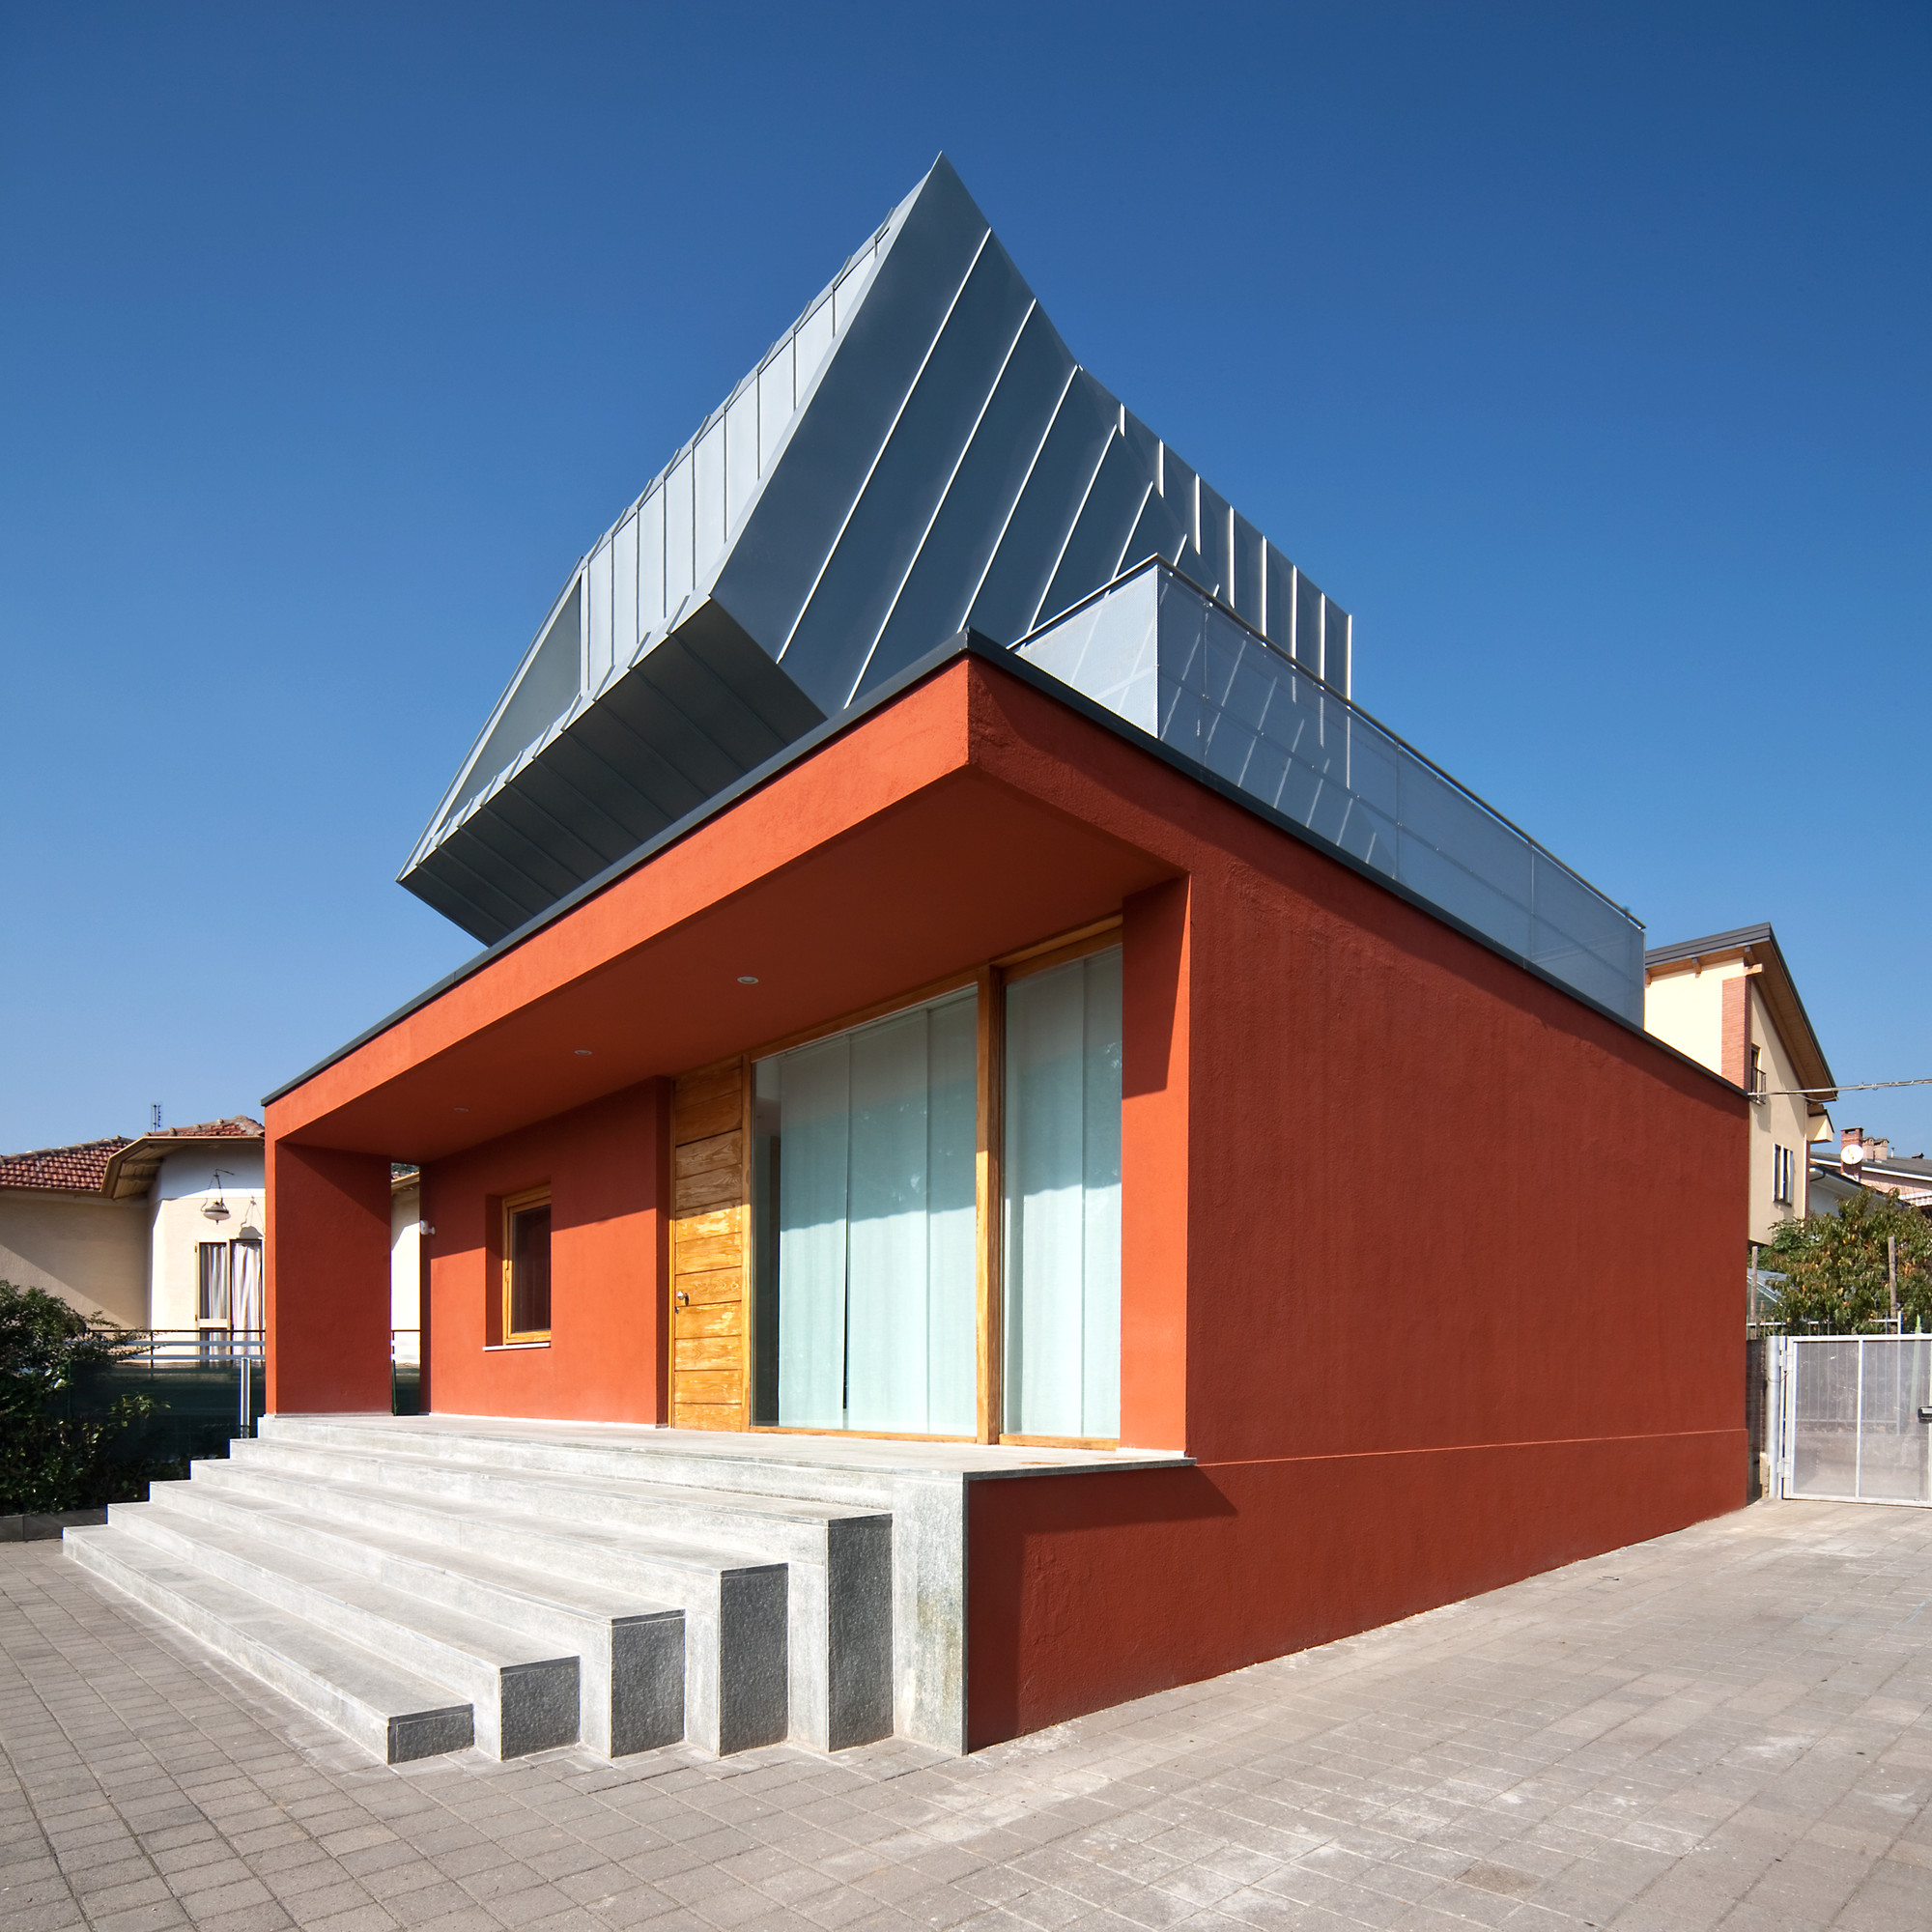 The House on the House / Raimondo Guidacci, © Beppe Giardino